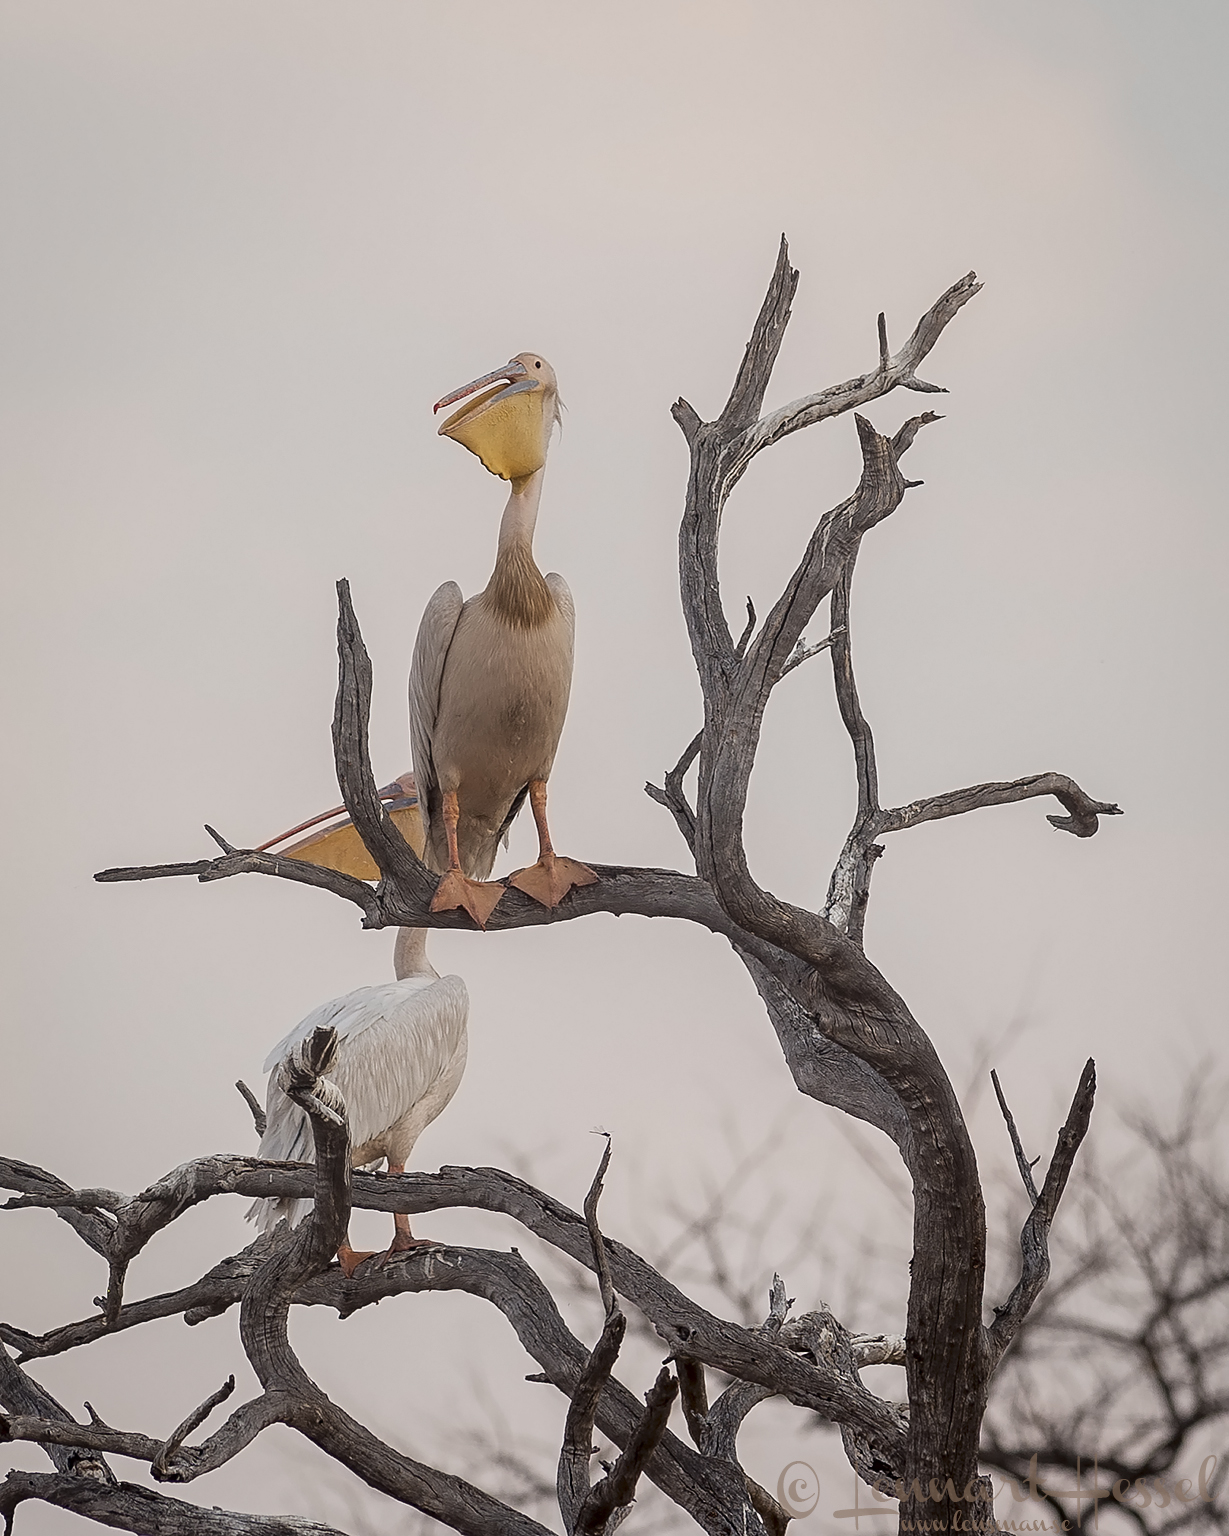 Pelicans in a tree in Savuti, Botswana